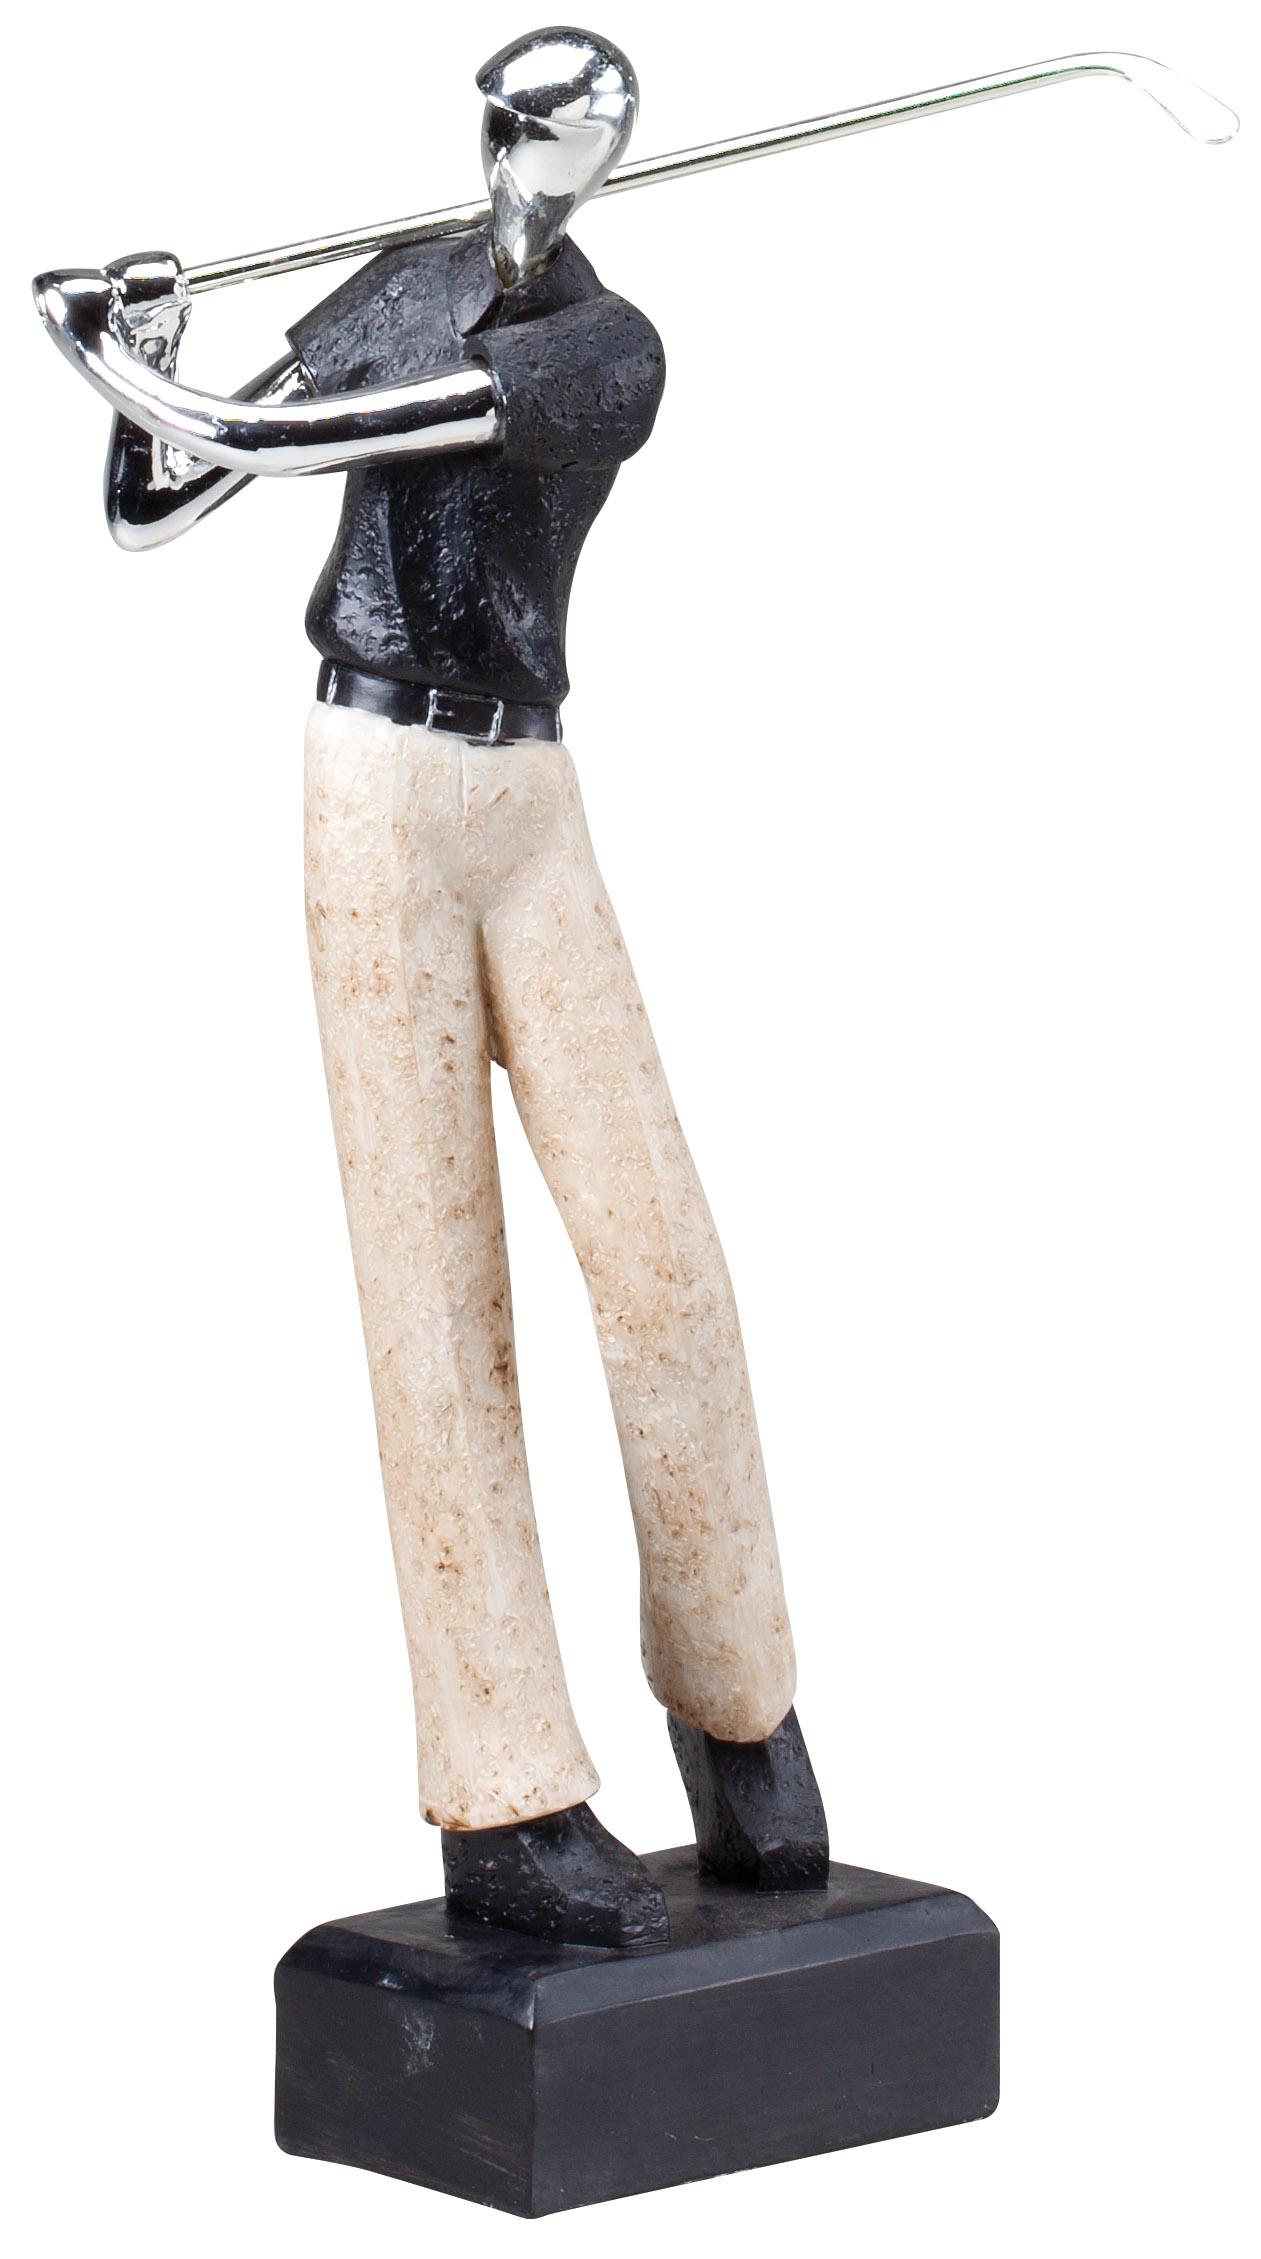 "Medium Resin - Male Golfer   RF20744 - 12.5"" tall   Price = $44"